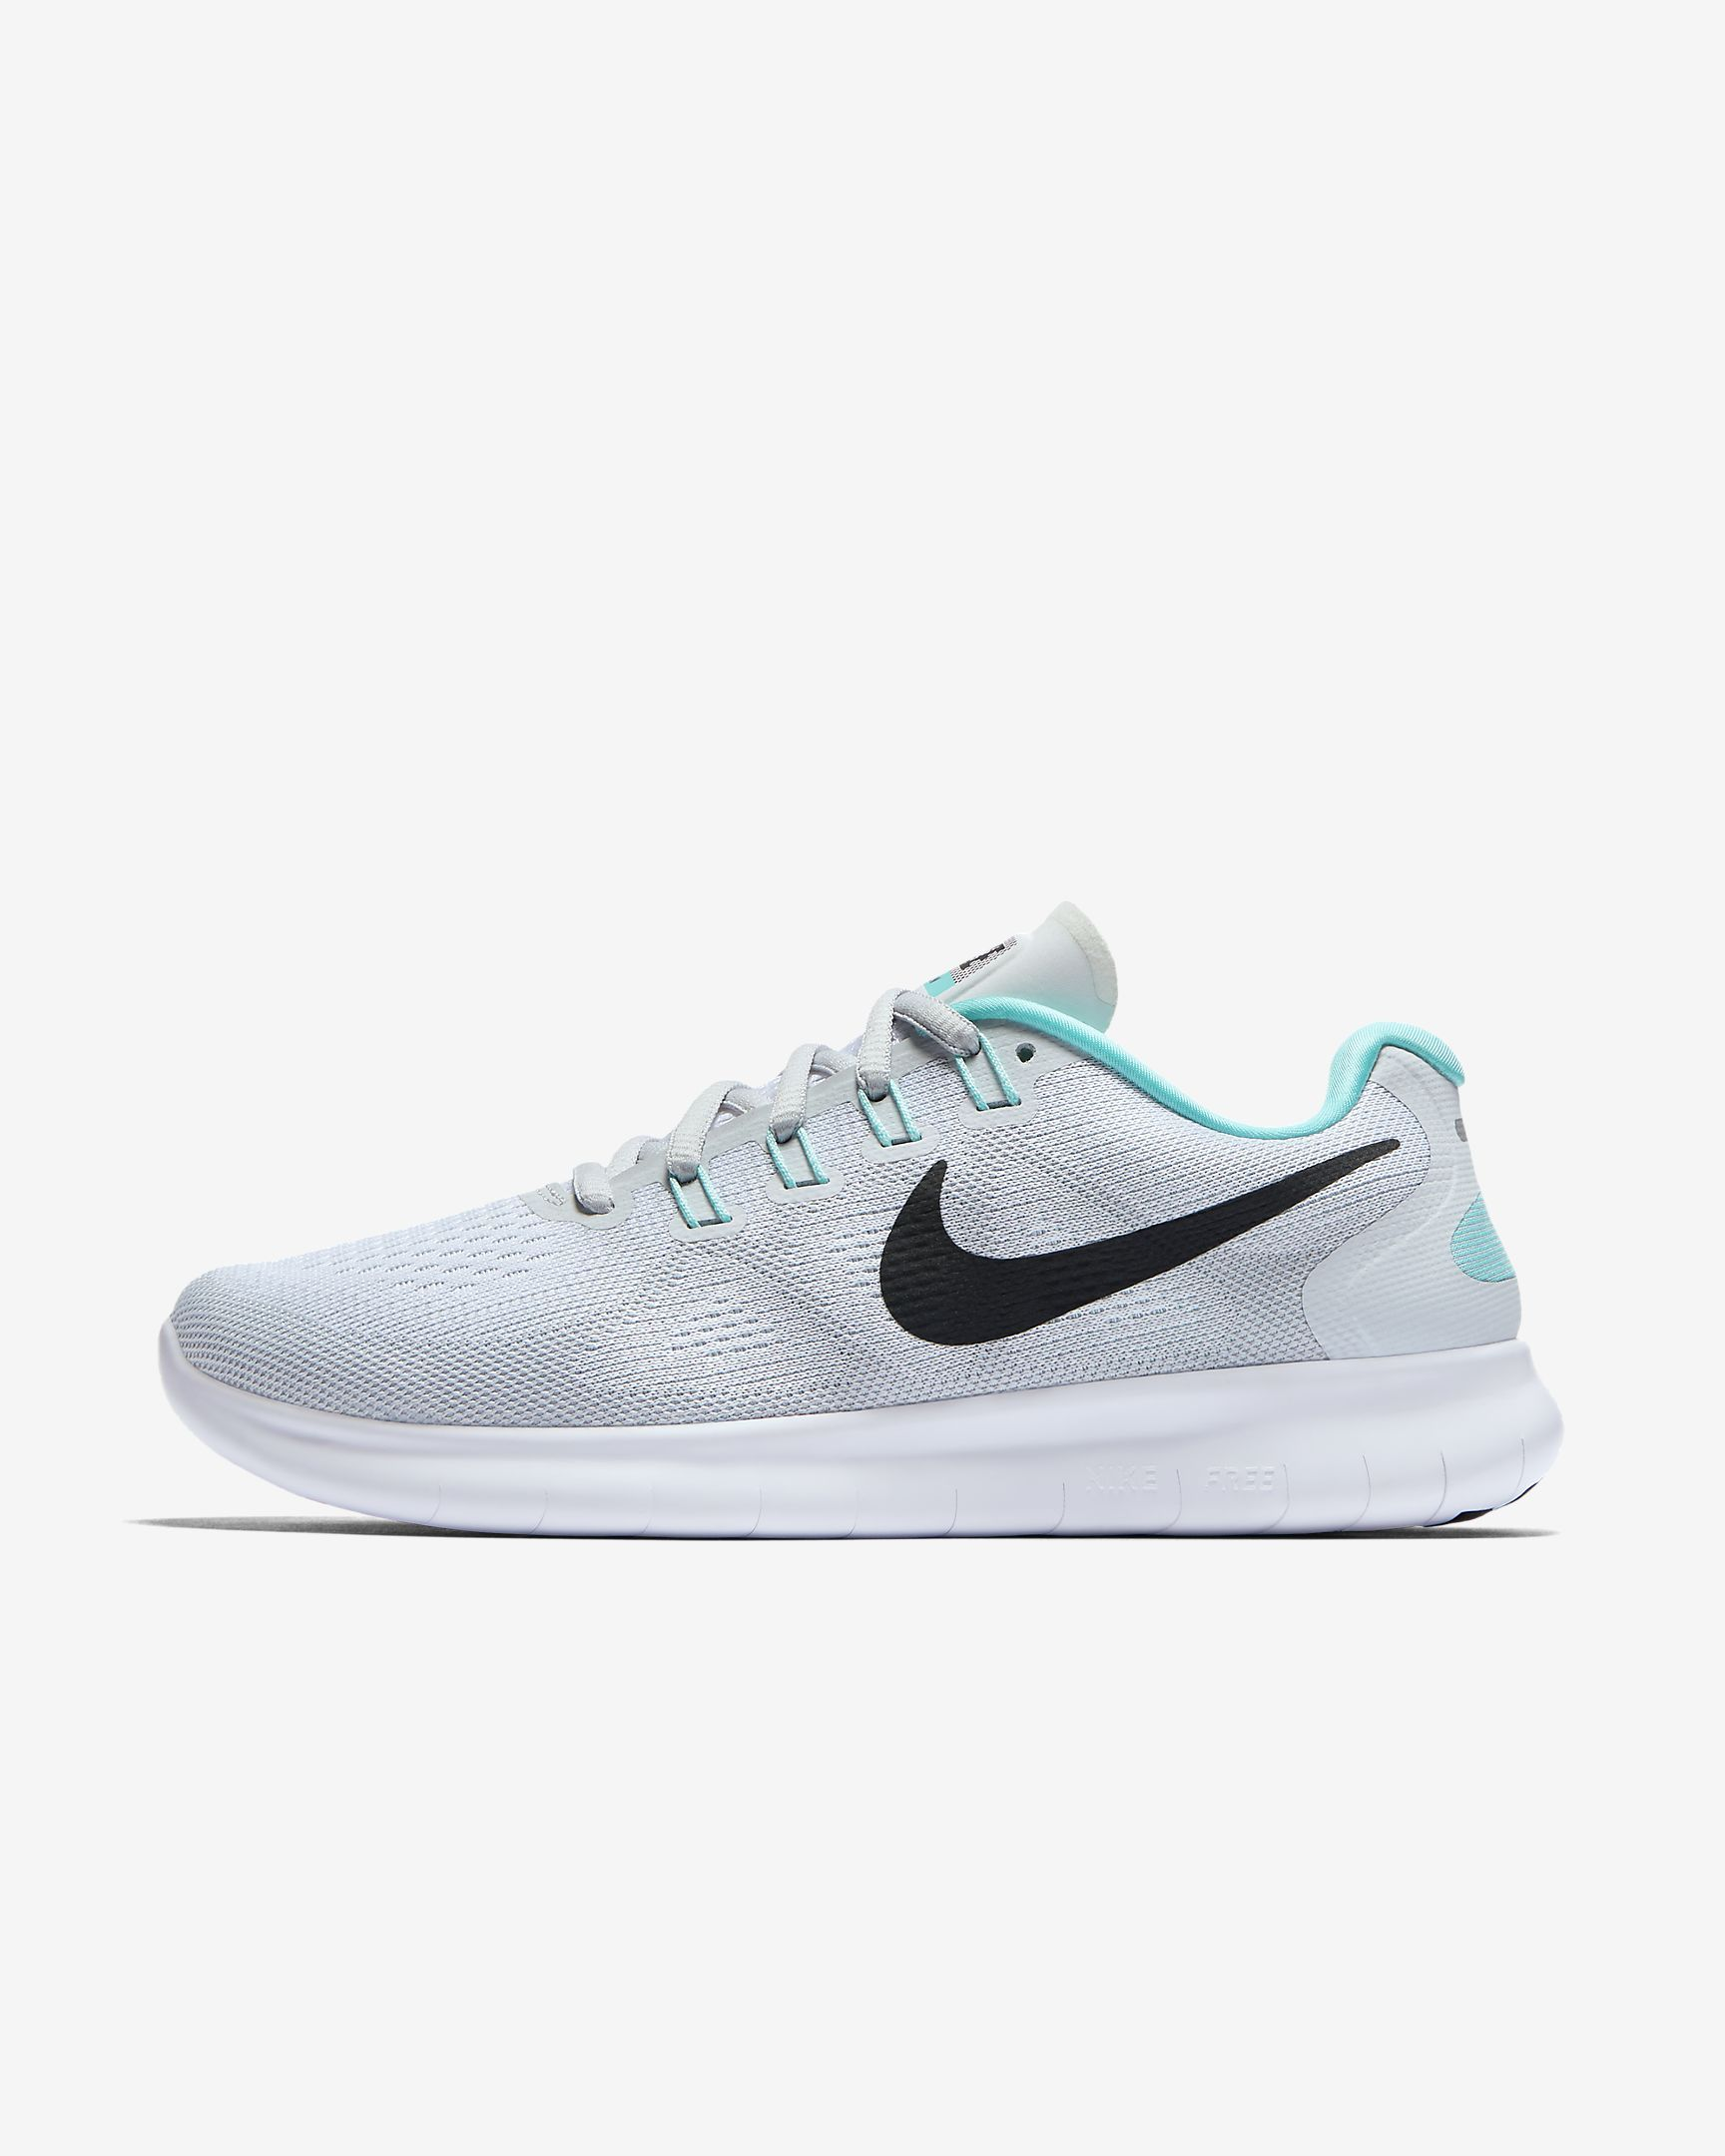 Ellos explorar en caso  Calzado de running para mujer Nike Free RN 2017 | Nike free, Sneakers,  Sneakers nike